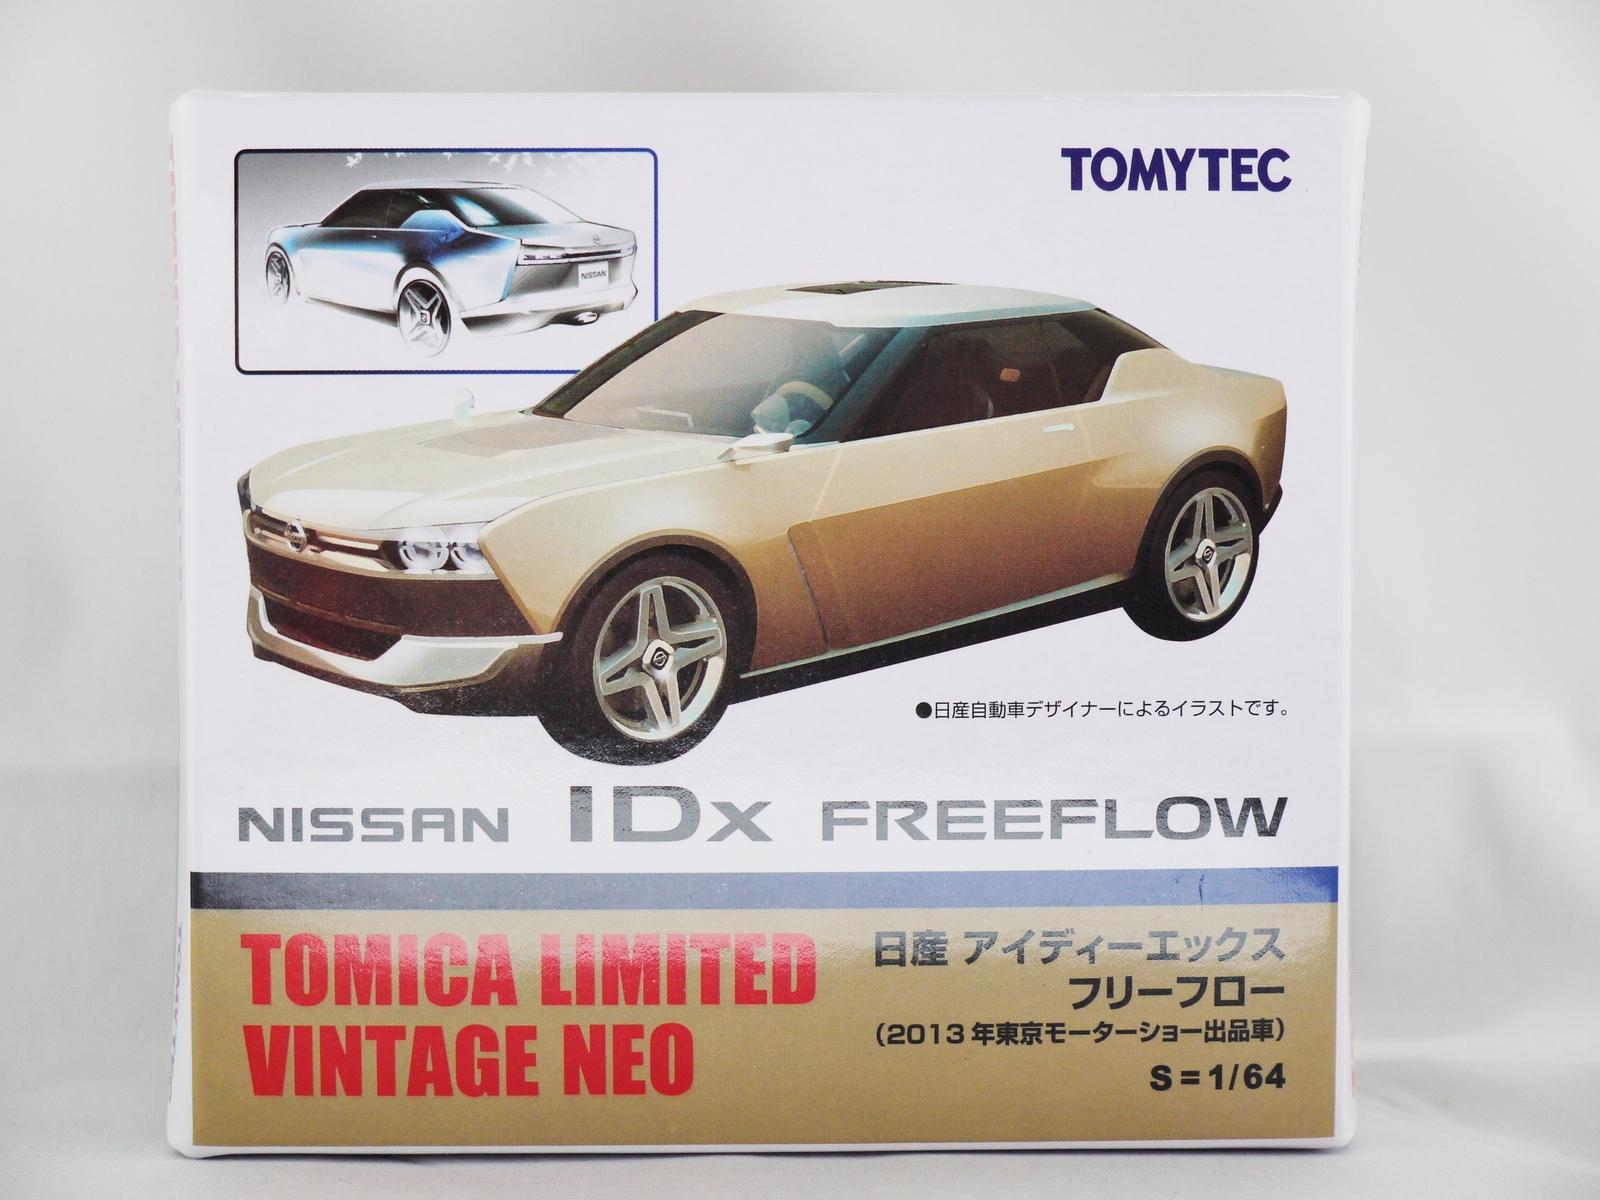 TAKARA TOMY TOMICA LIMITED Race Sport Car VINTAGE NEO NISSAN IDX FREEFLOW  Veh.